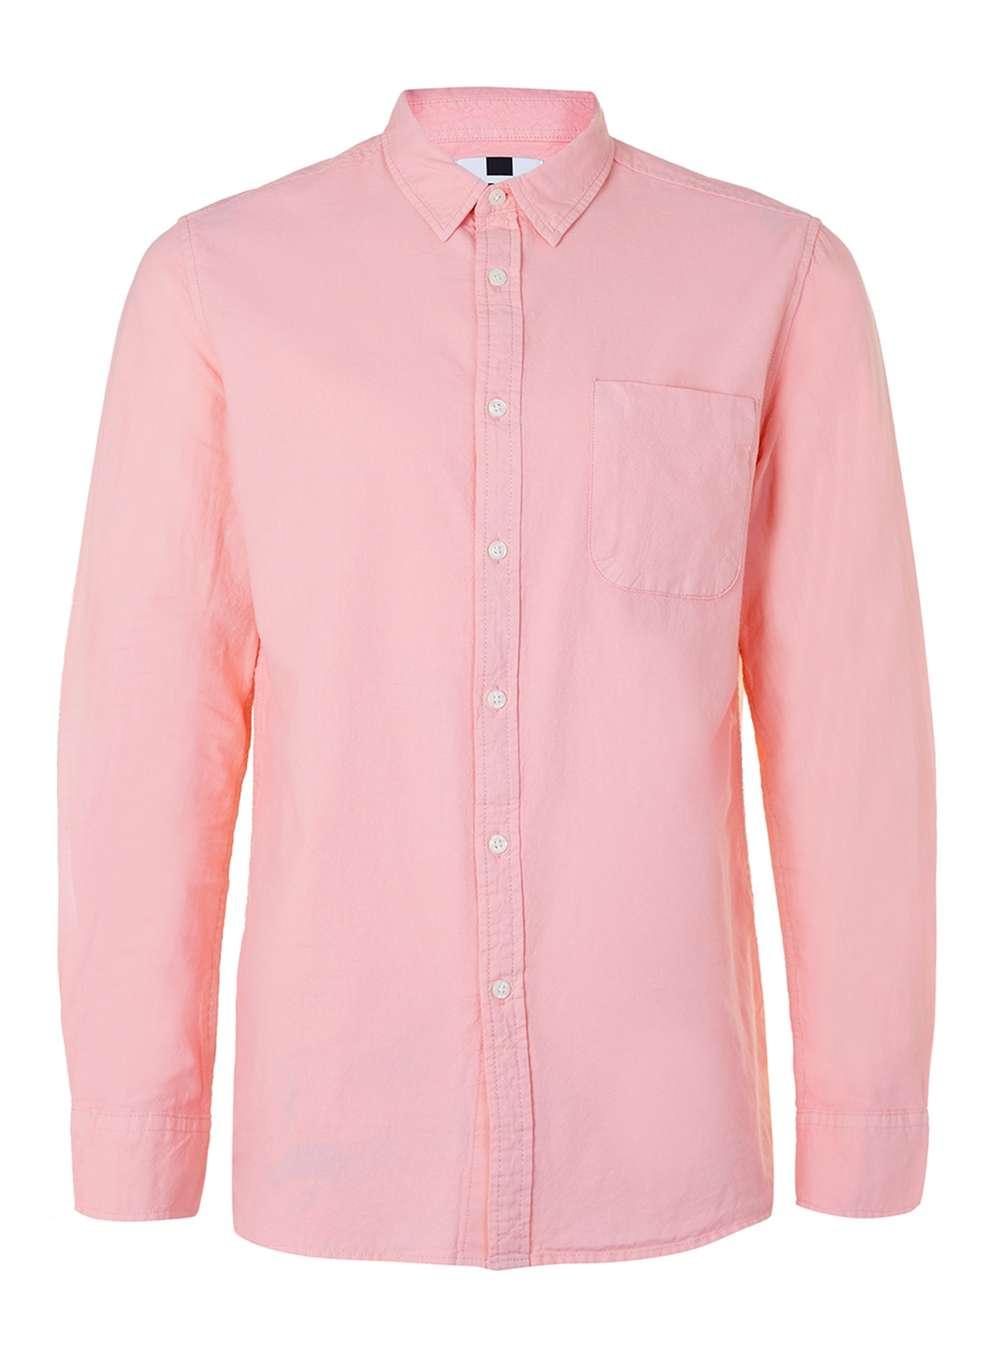 sam-c-perry-all-navy-pink-woven-topman-woven.jpg